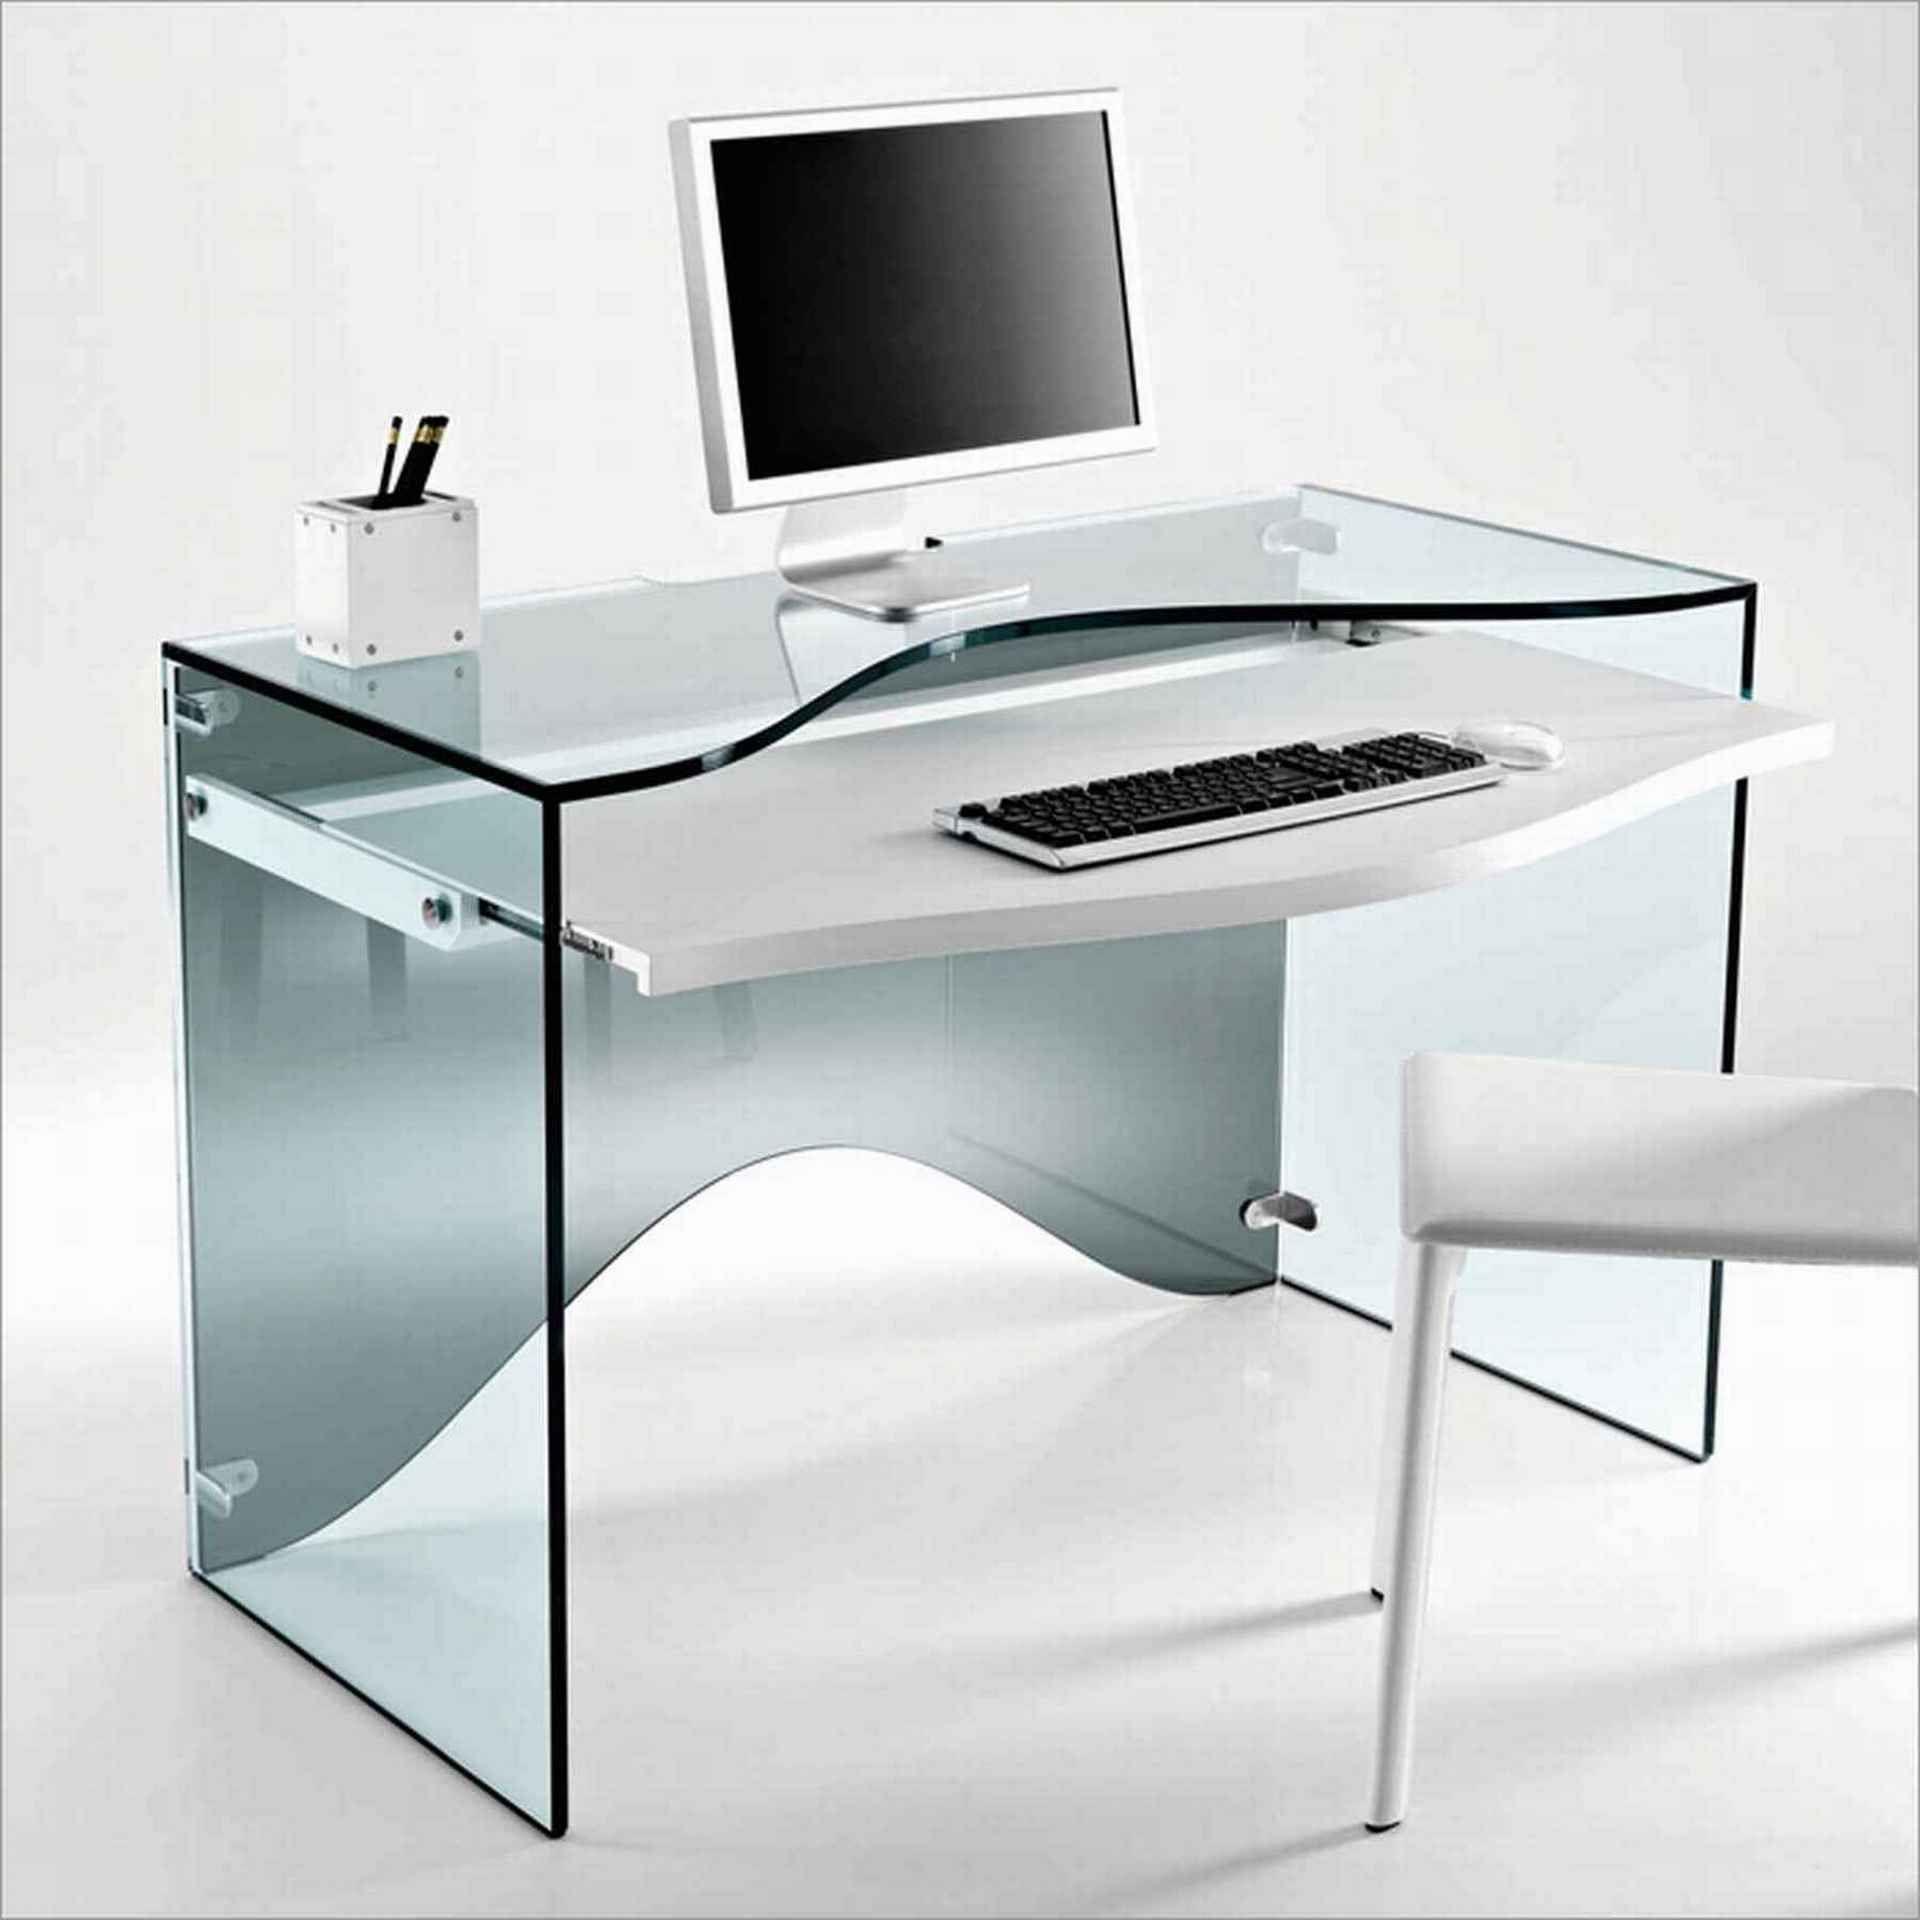 20 Compact Glass Computer Desk Ideas For Decorating A Desk Check More At Http Michael Computer Desk Design Modern Home Office Furniture Modern Small Desk